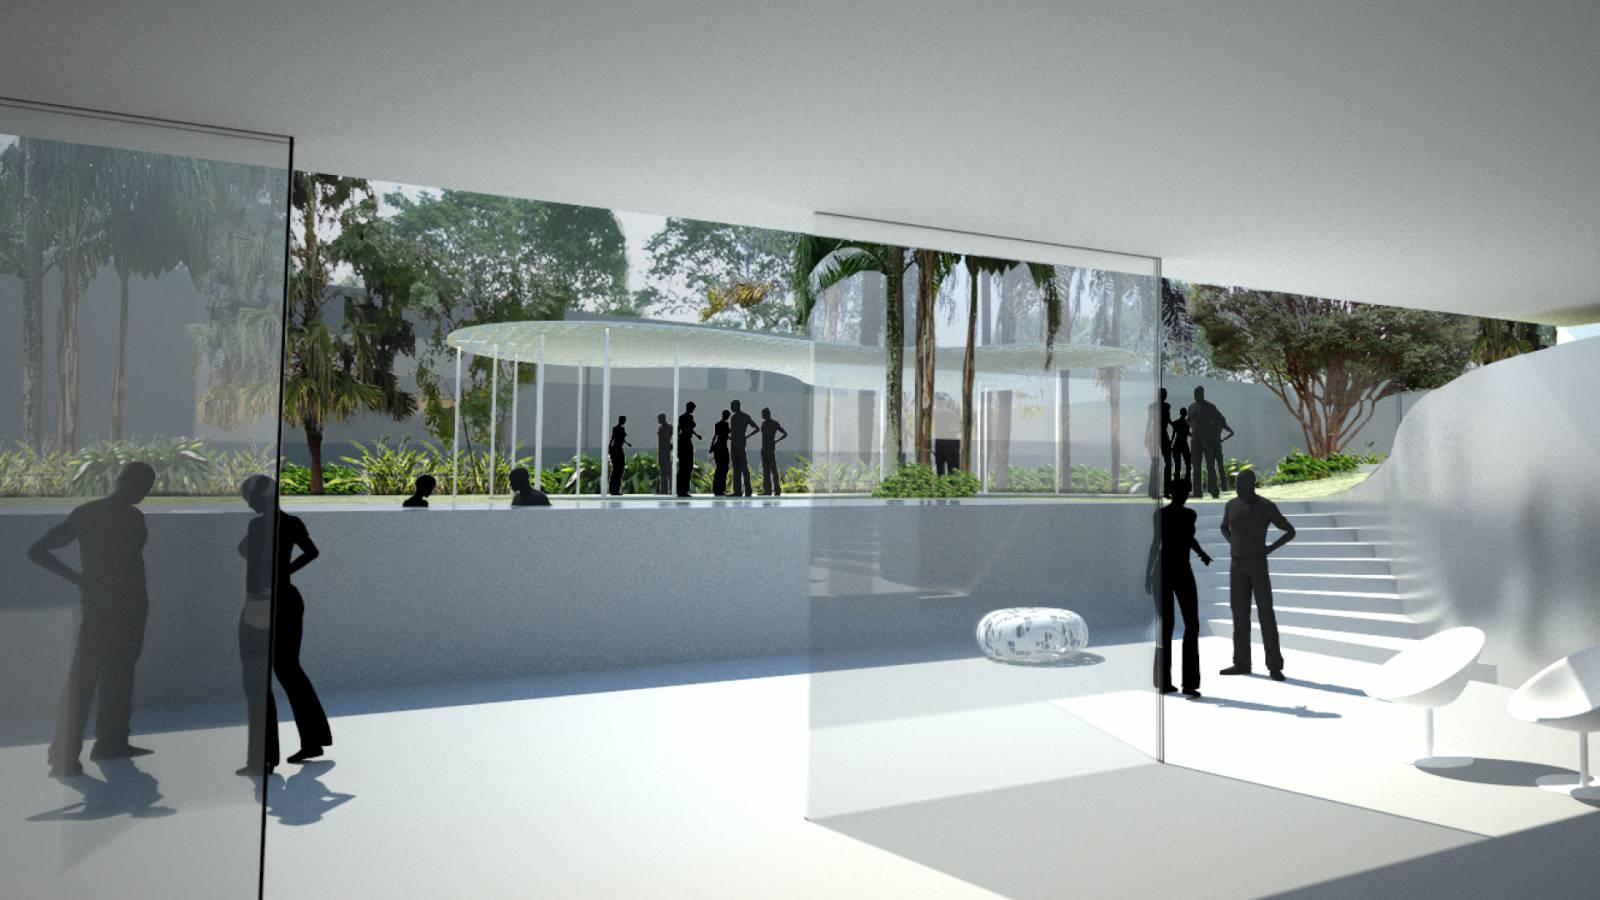 LOWER LEVEL EXHIBITION SPACE - São Paulo Art Pavillion - SPOL Architects